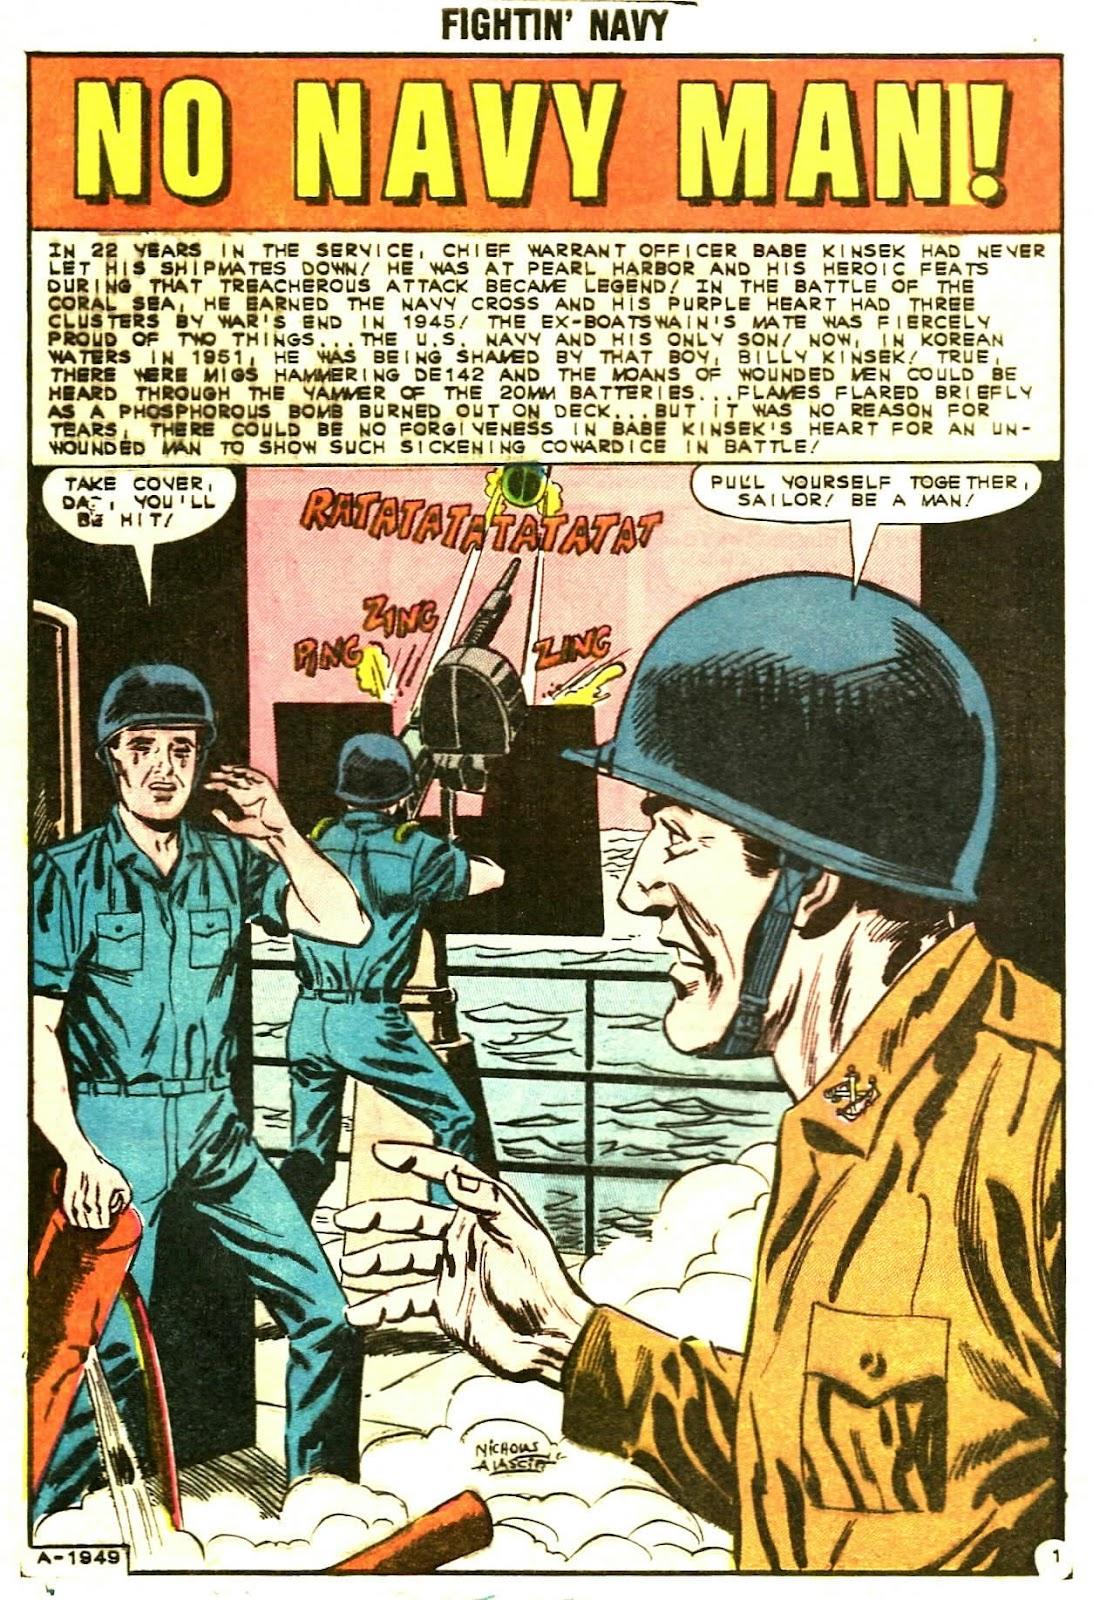 Read online Fightin' Navy comic -  Issue #107 - 8